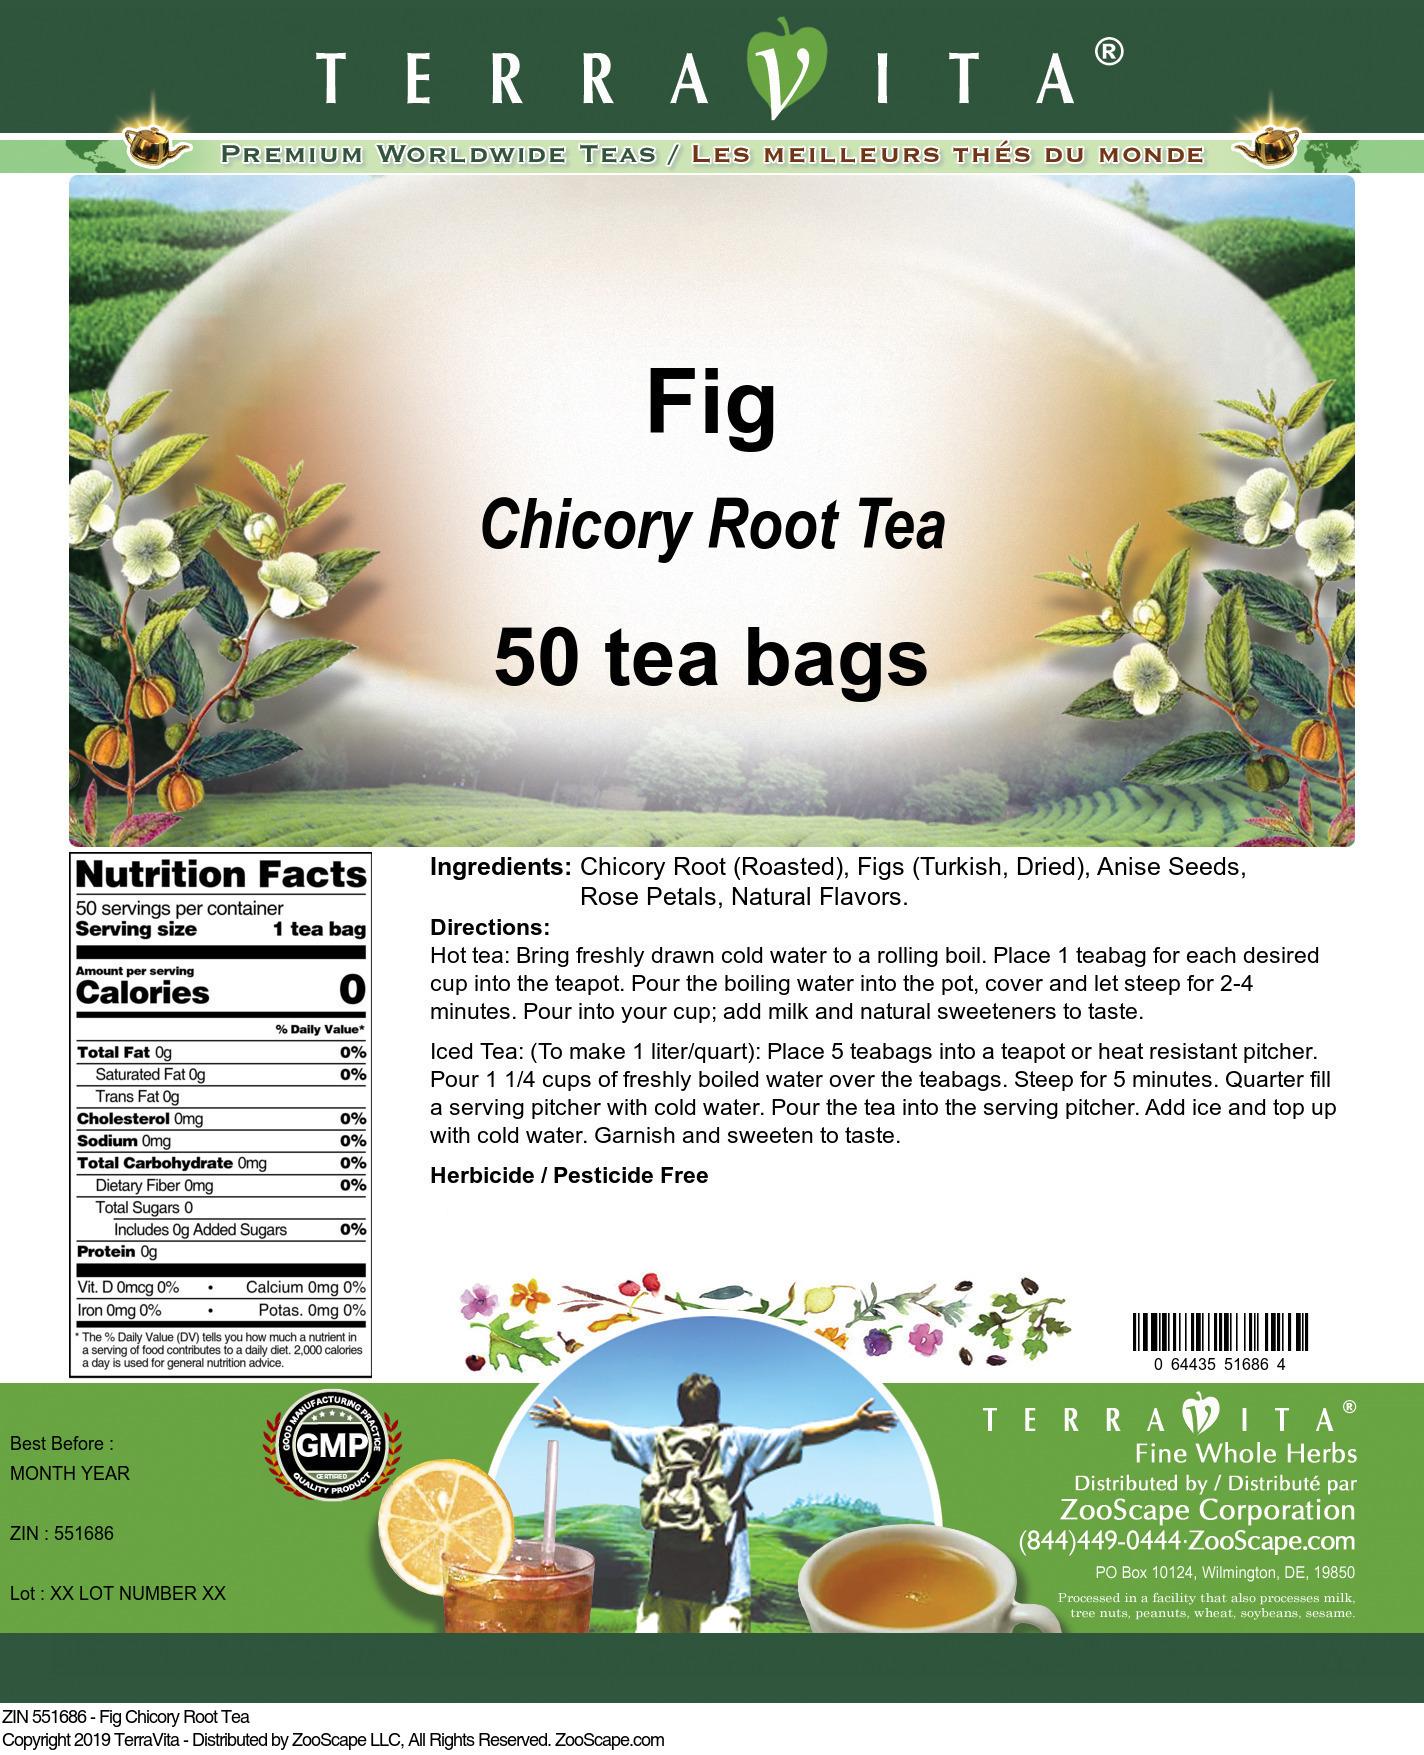 Fig Chicory Root Tea